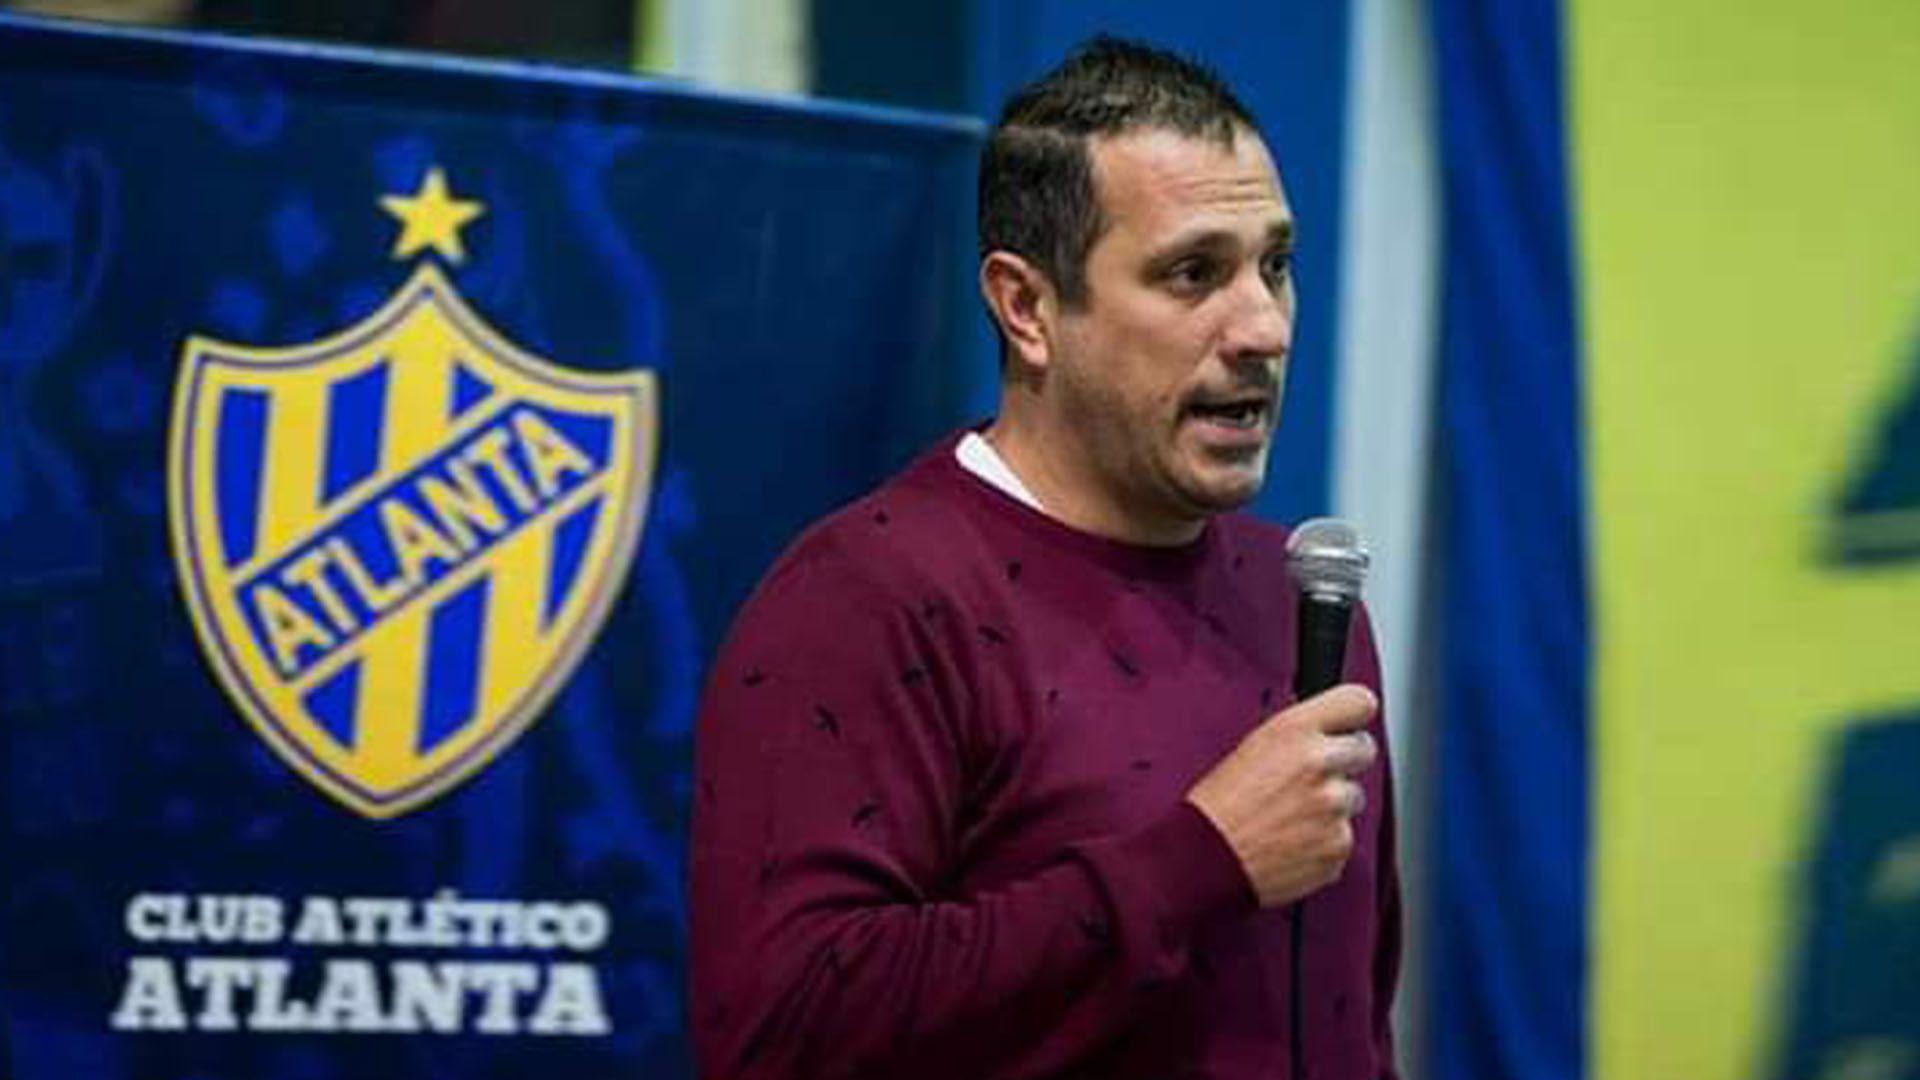 Gabriel Greco